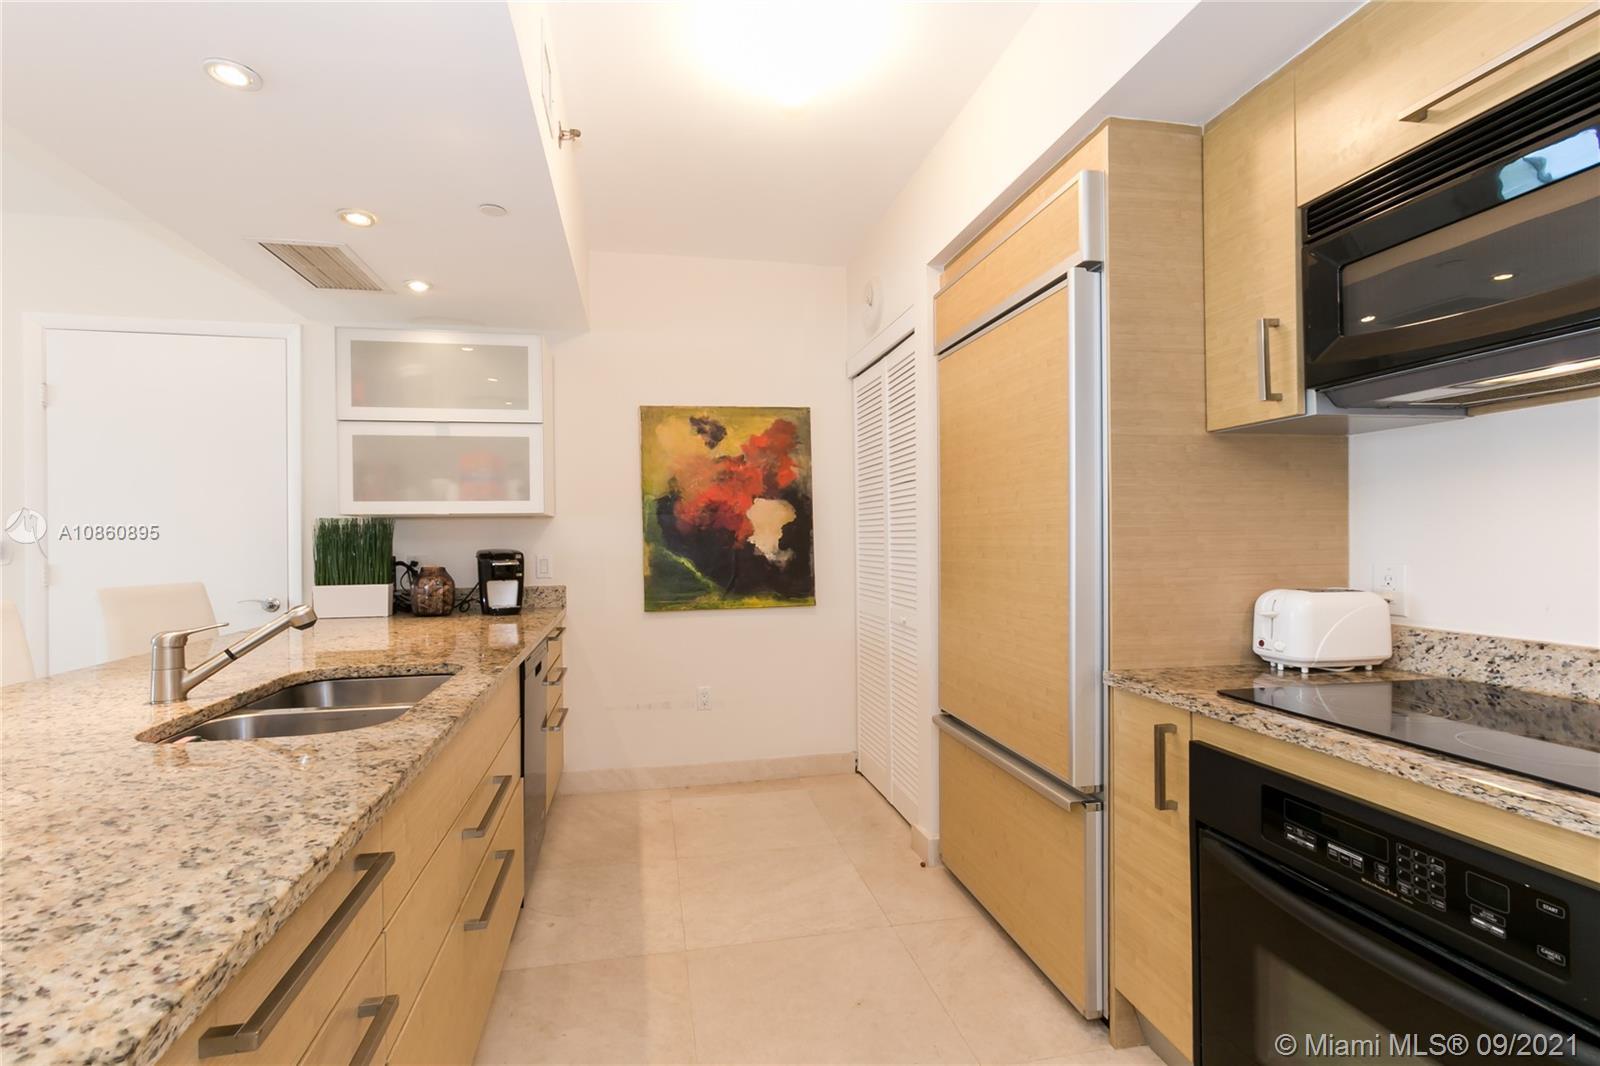 2110 2 / 2 1337 sq. ft. $ 2020-09-25 0 Photo